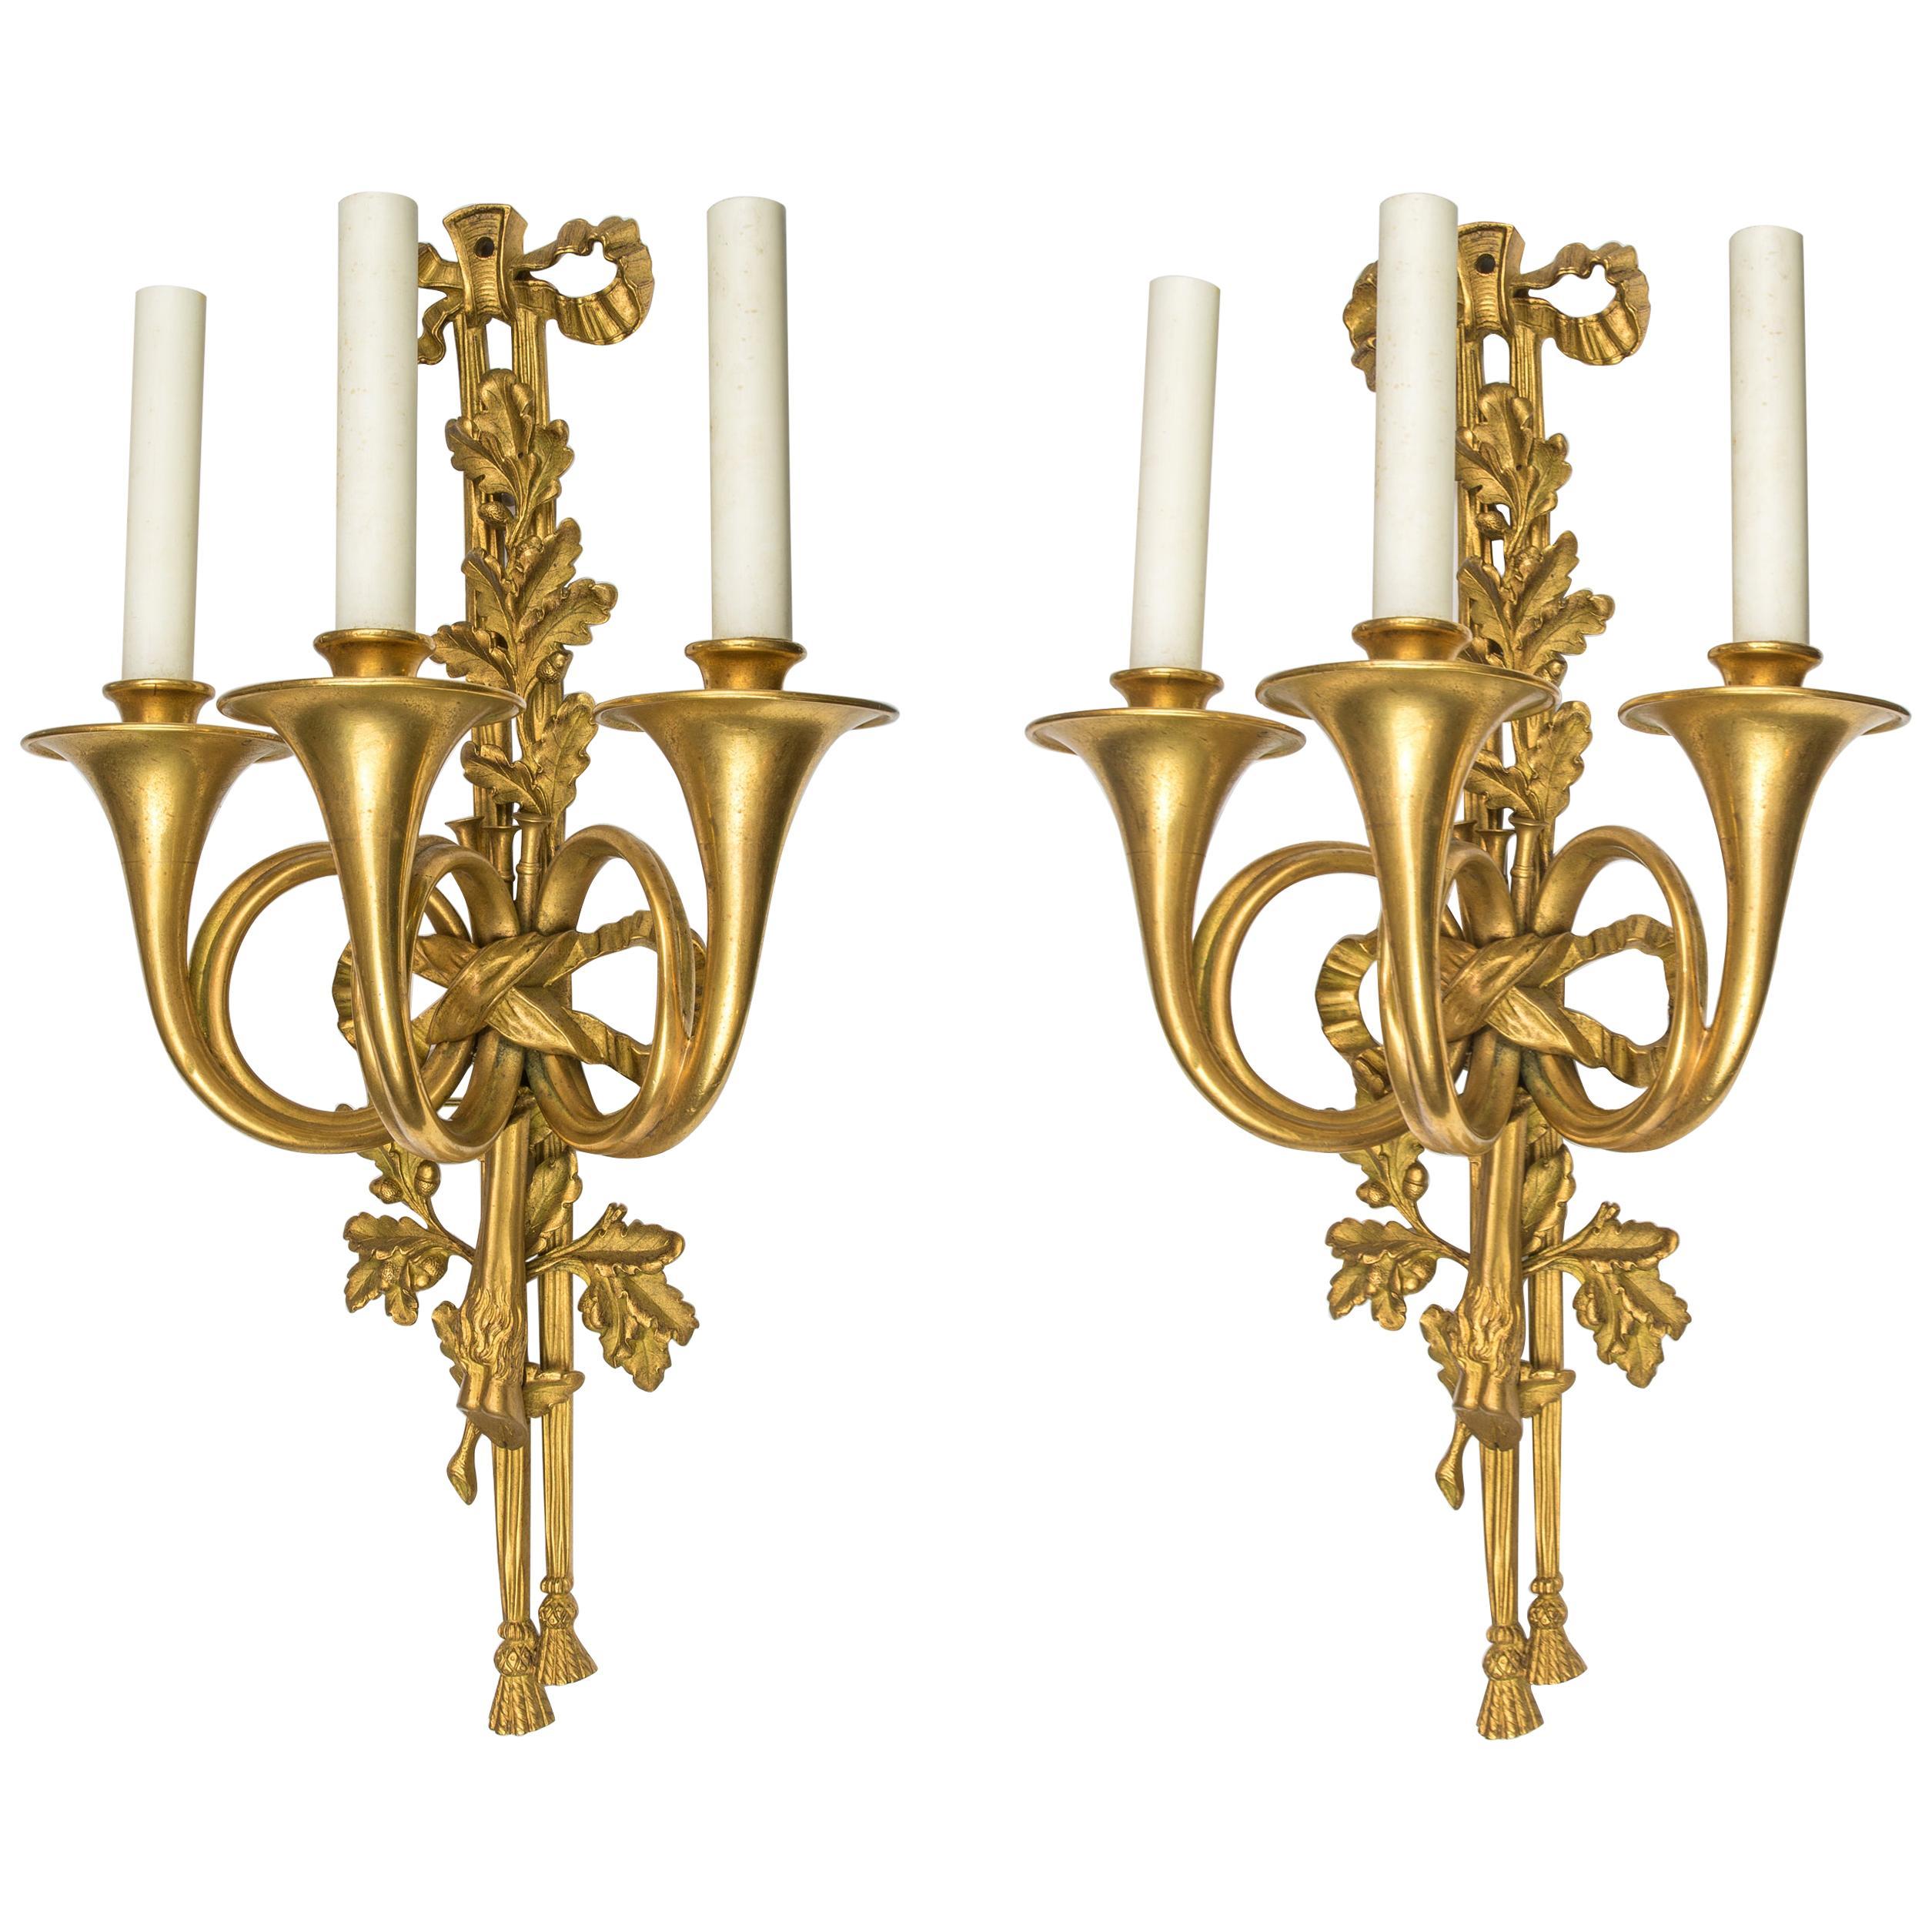 Pair of Louis XVI Style Three-Light Gilt Bronze Wall Sconces